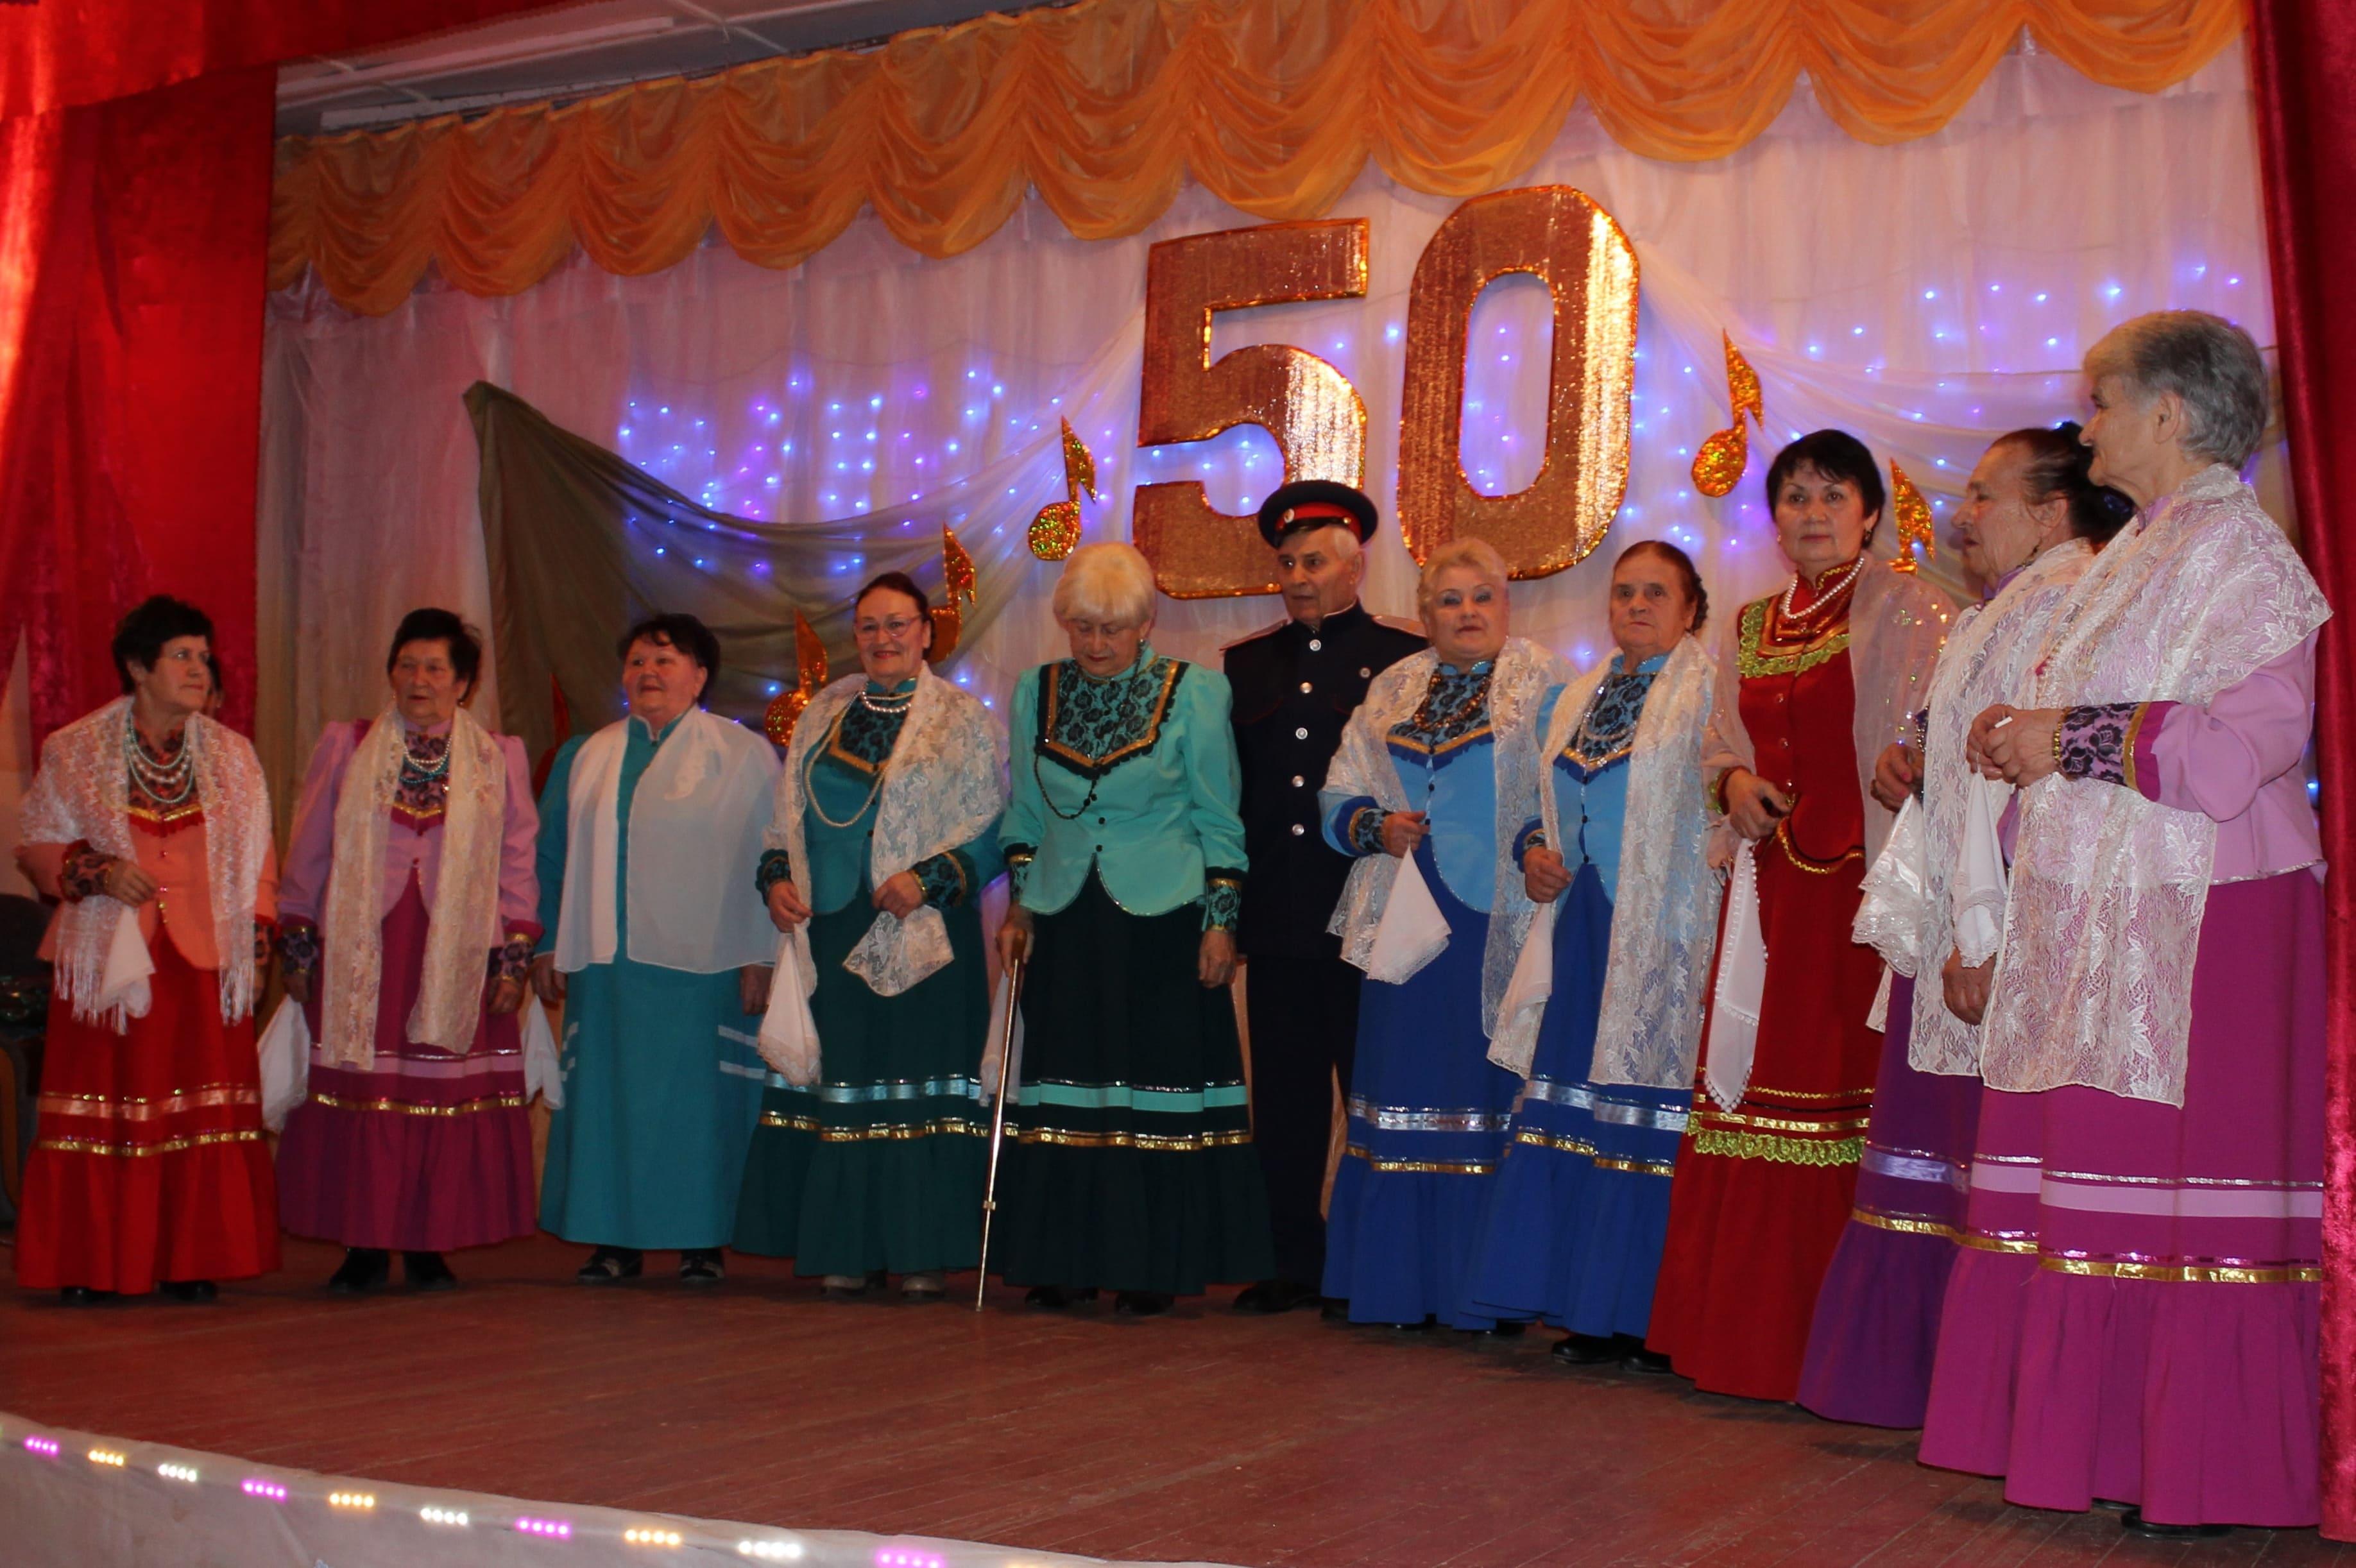 Юбилей народного хора  «Нам 50 — мы дарим вам свои сердца»